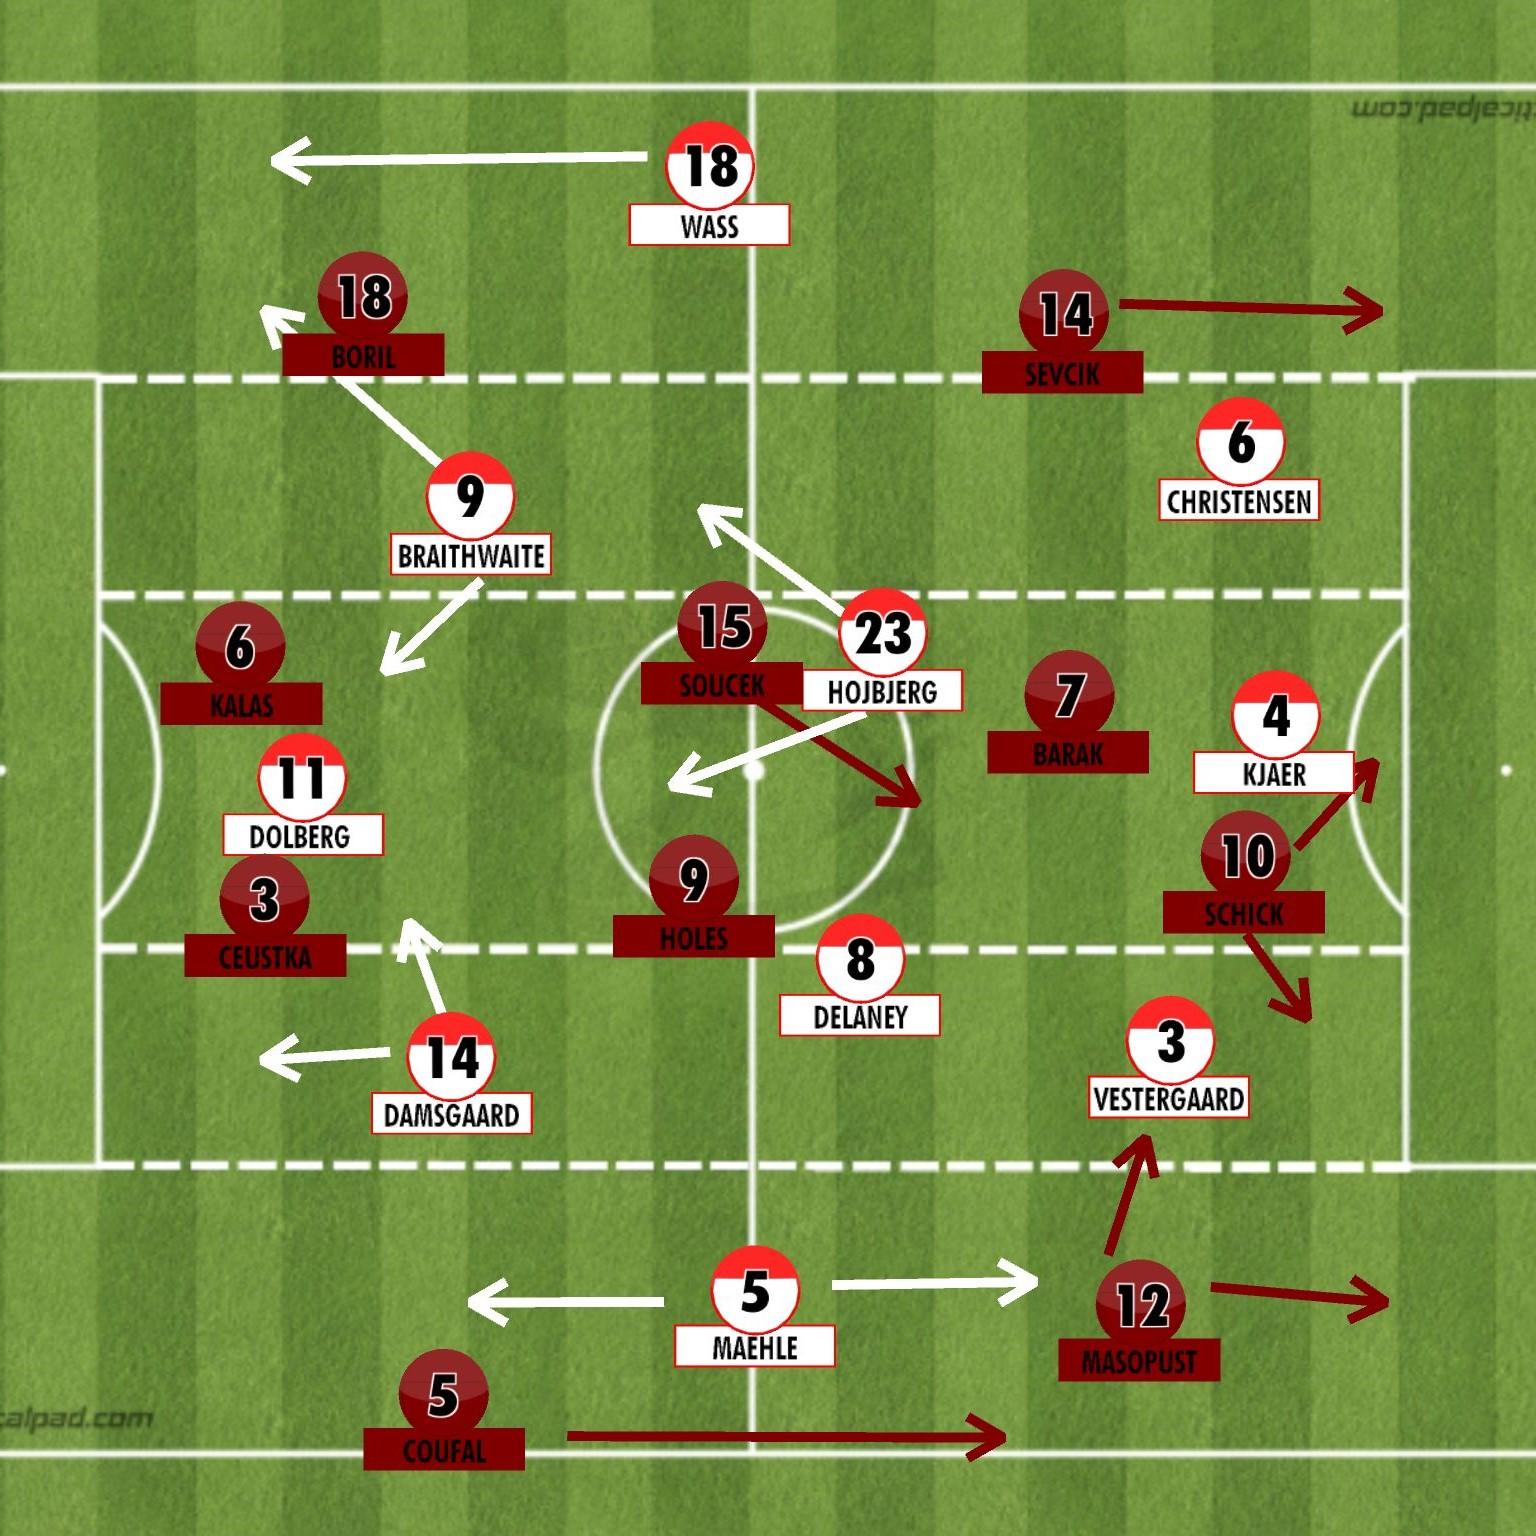 Czech Republic 1-2 Denmark